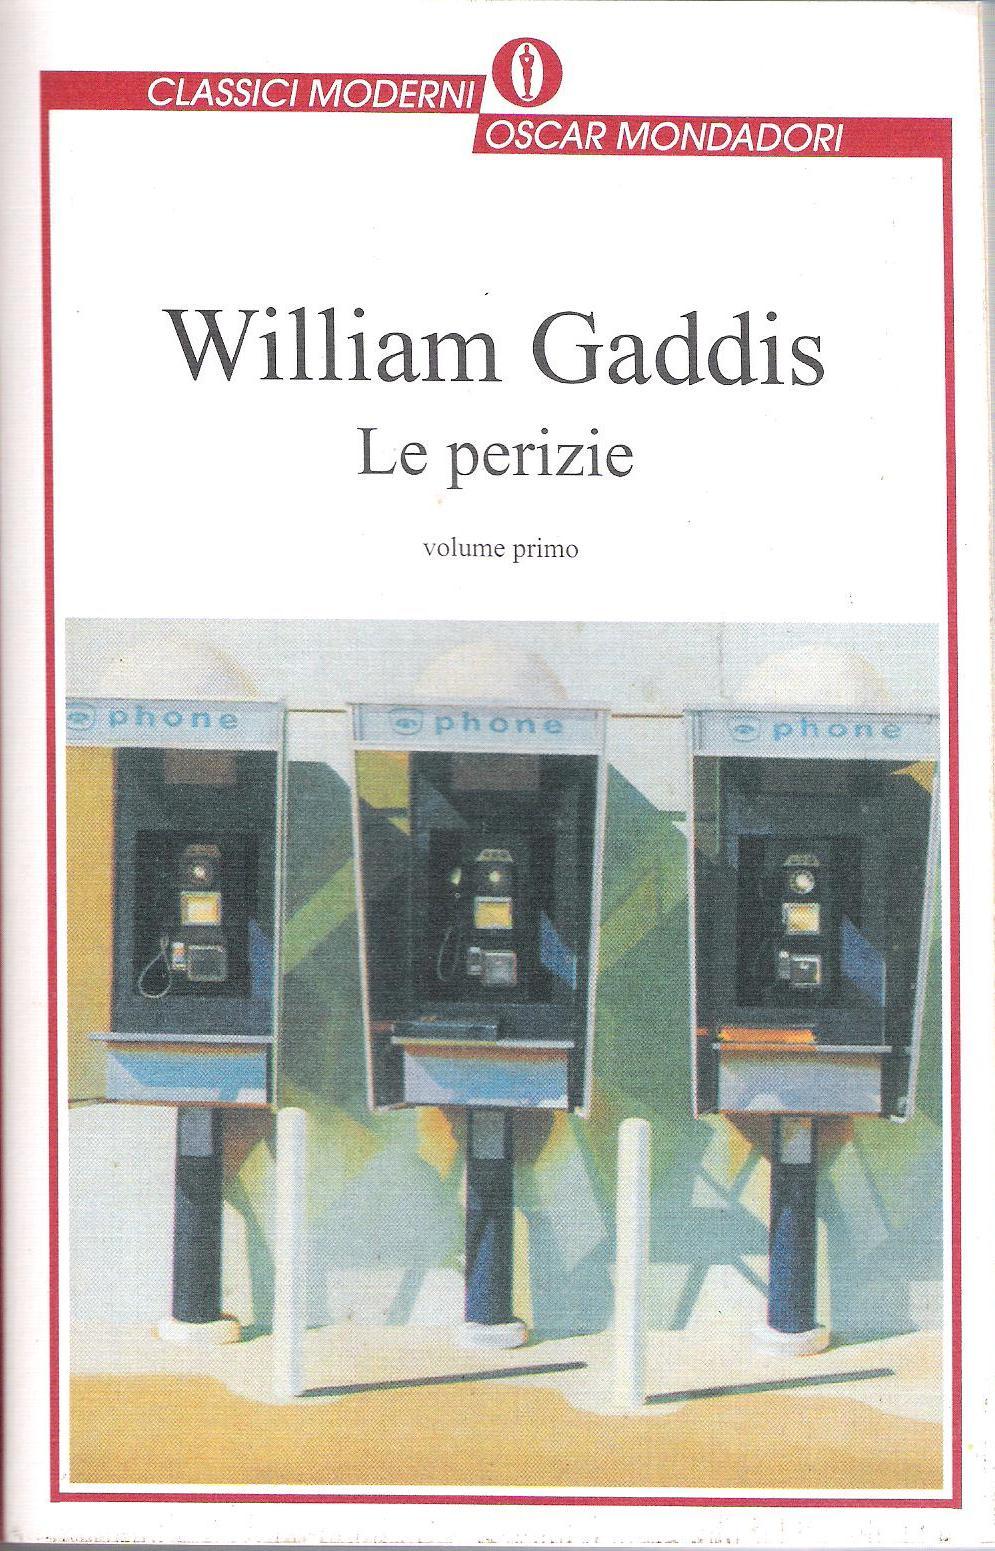 William Gaddis, Le perizie, Mondadori